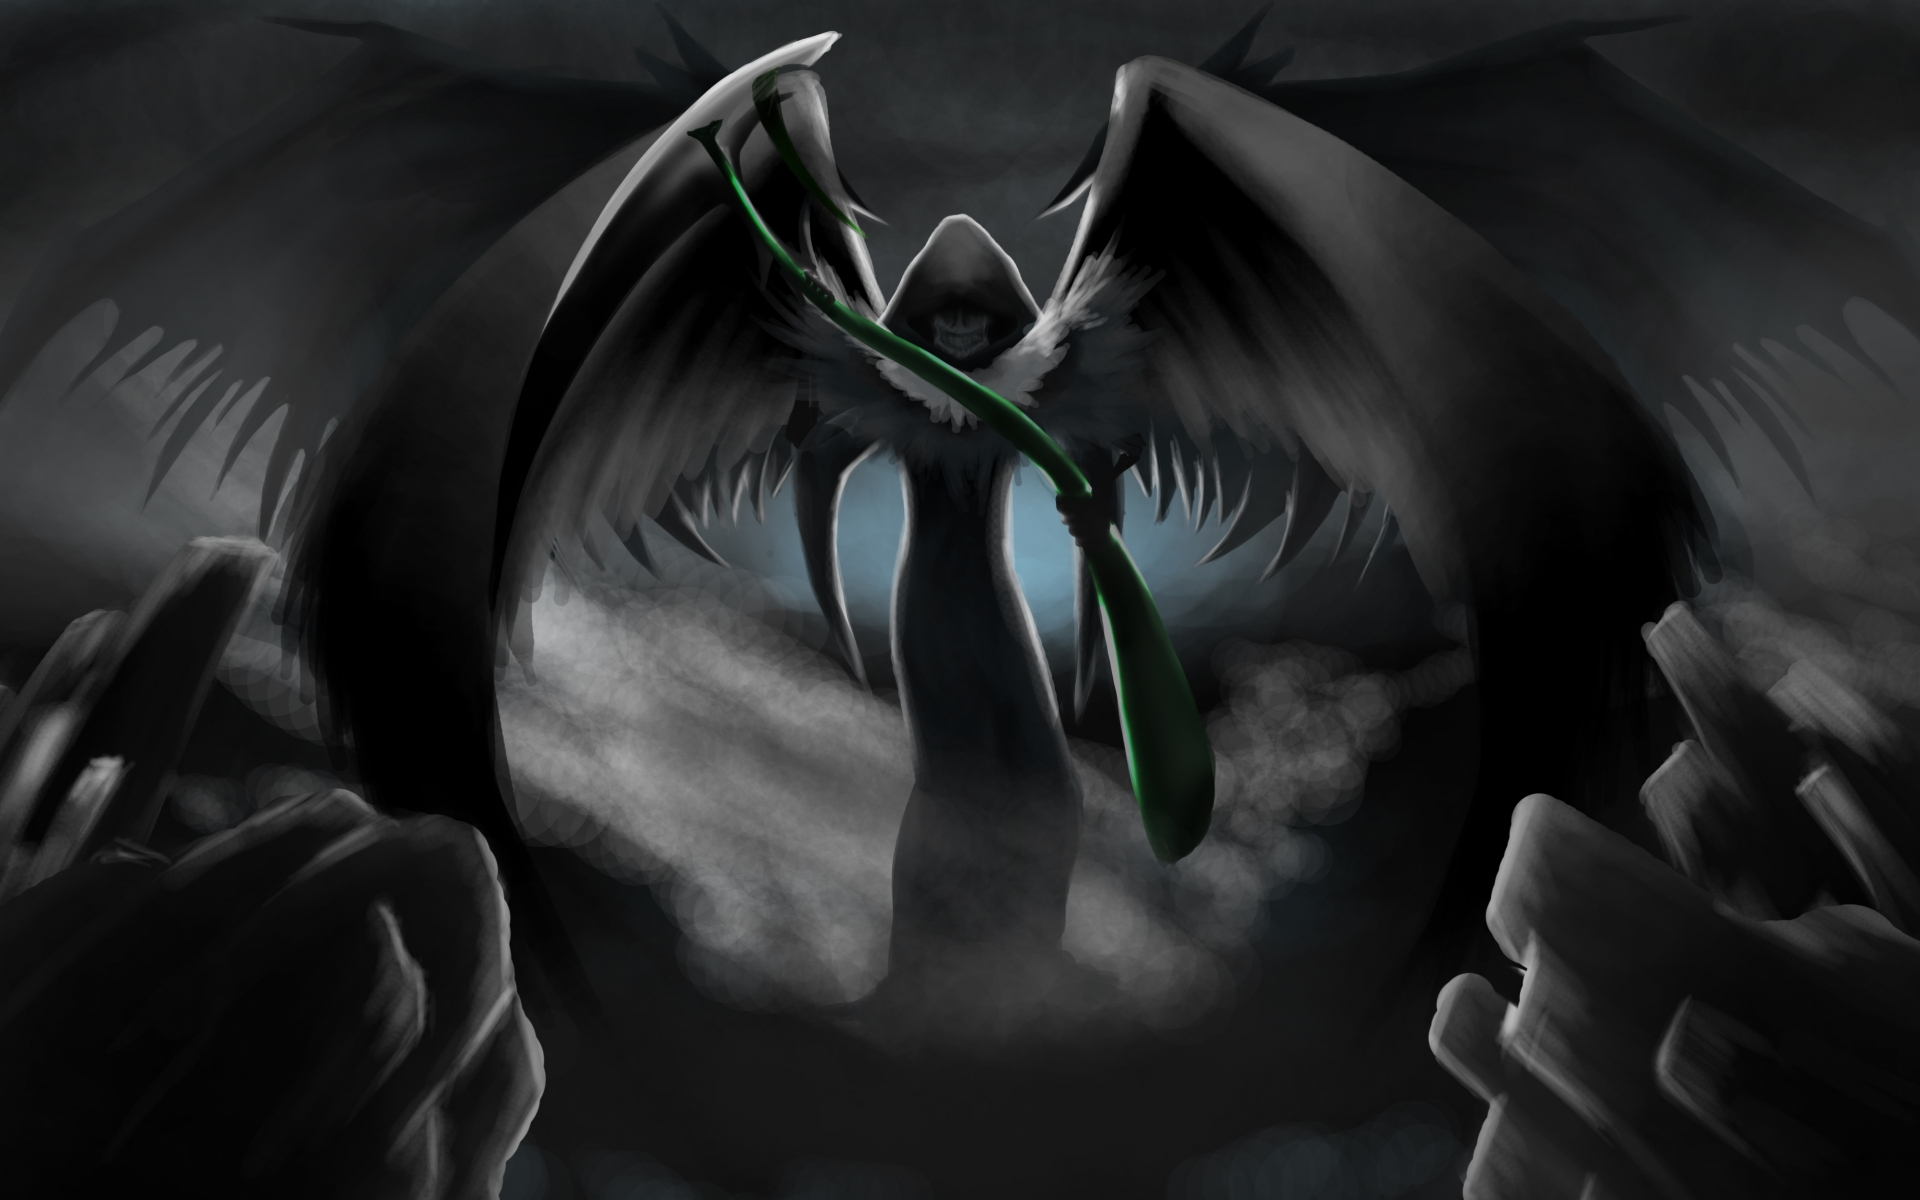 Grim Reaper With Wings Wallpaper wallpaper Grim Reaper With Wings 1920x1200